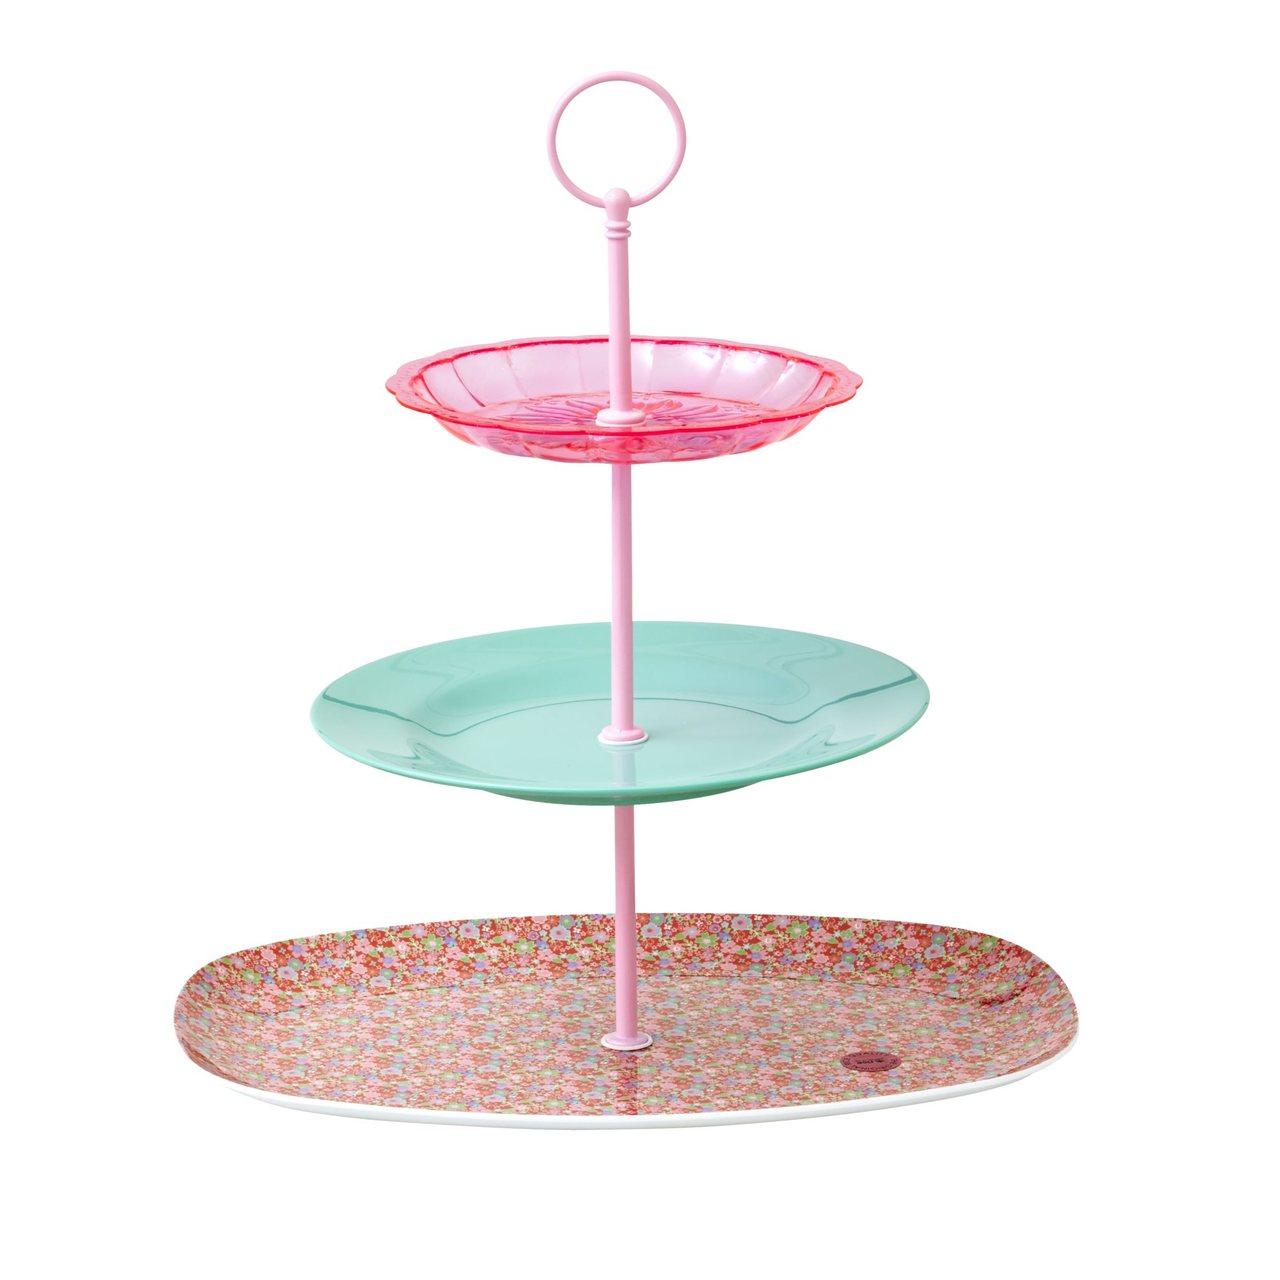 Sample Cake Stand